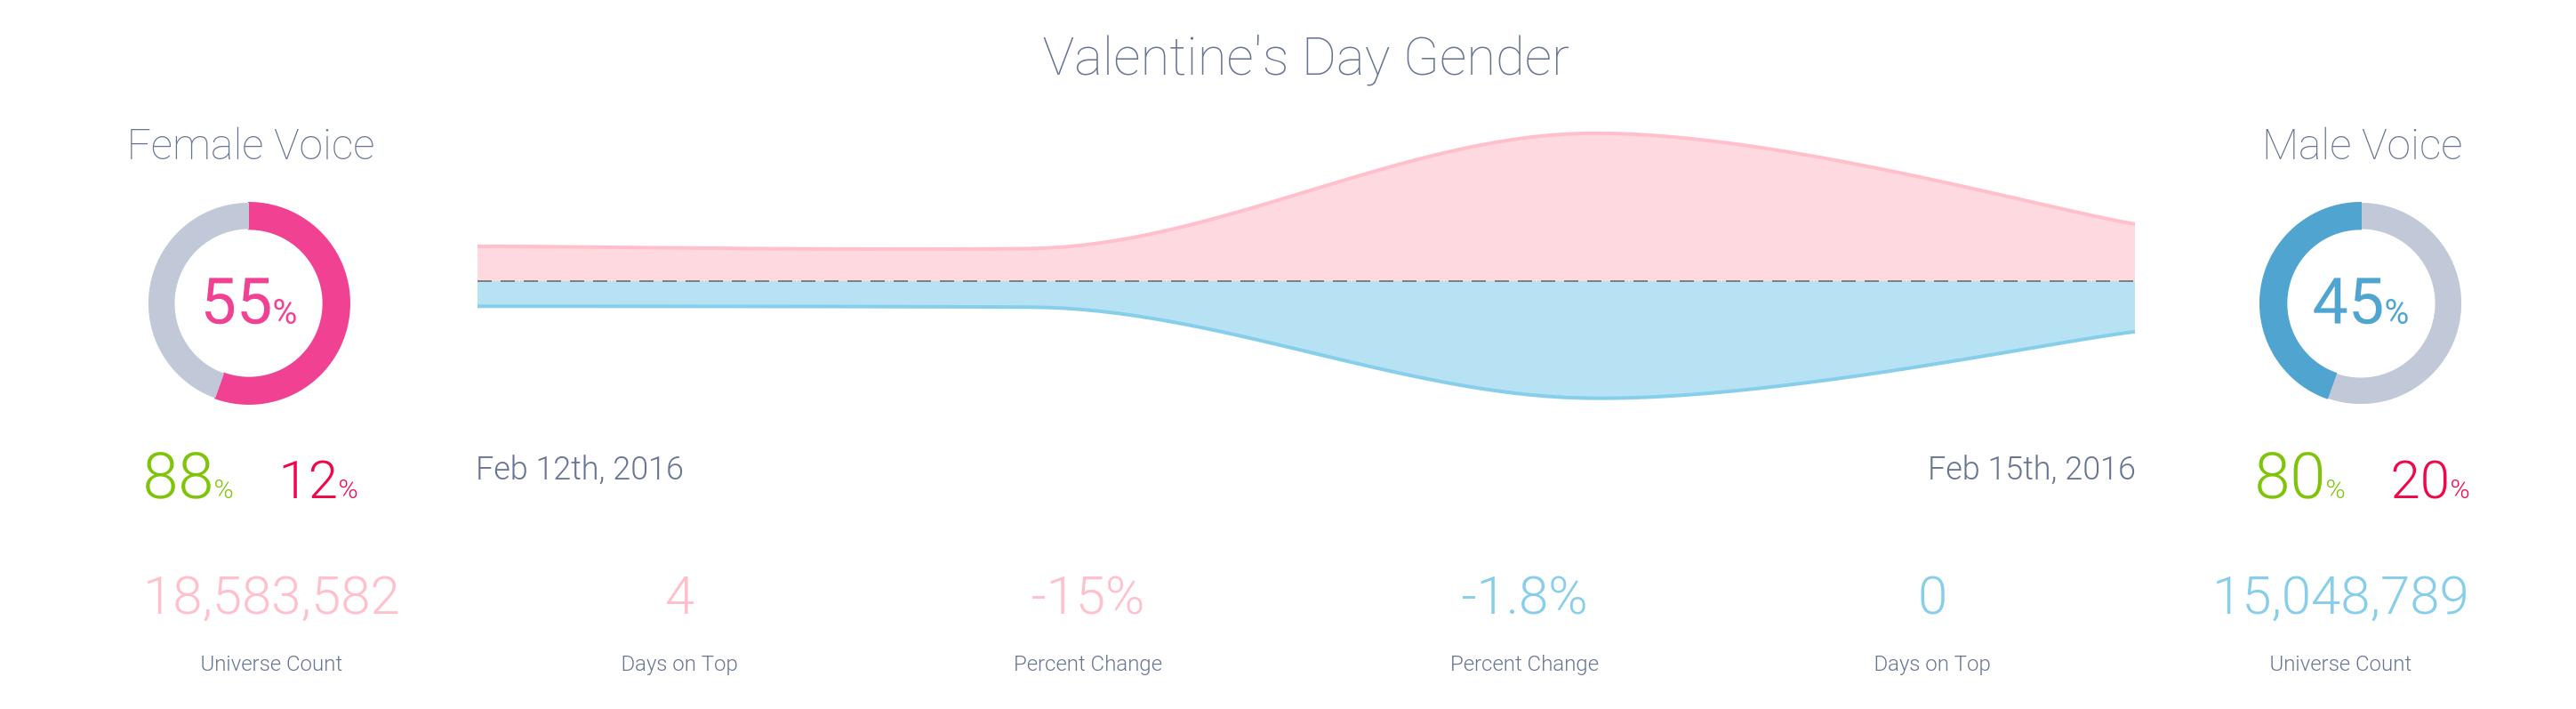 valentines-day_gender.png